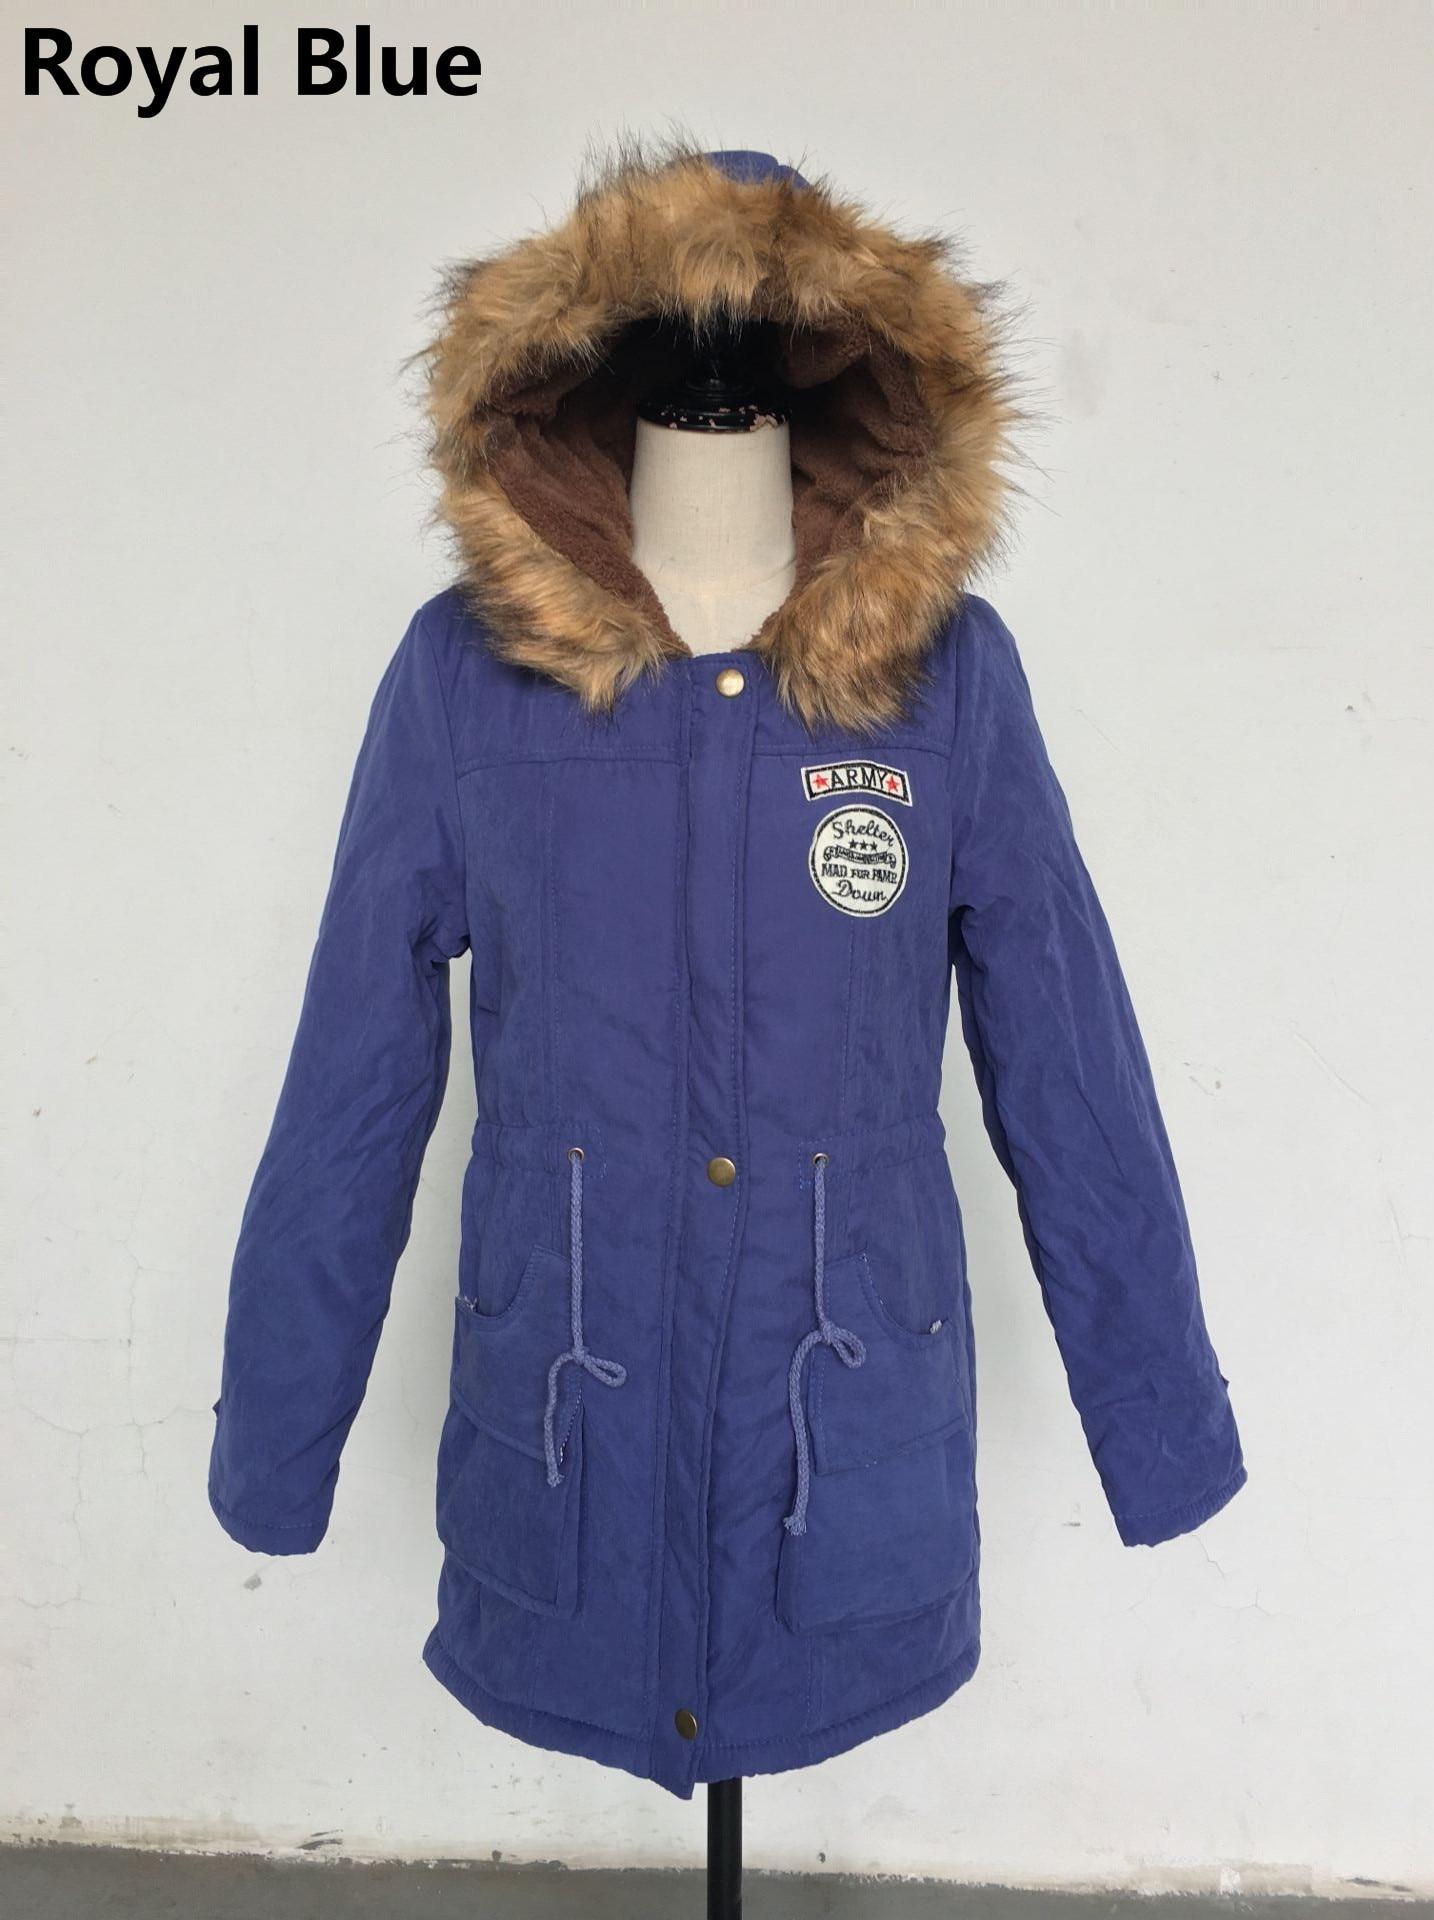 HTB1BXRloN1YBuNjy1zcq6zNcXXai Women Parka Fashion Autumn Winter Warm Jackets Women Fur Collar Coats Long Parkas Hoodies Office Lady Cotton Plus Size